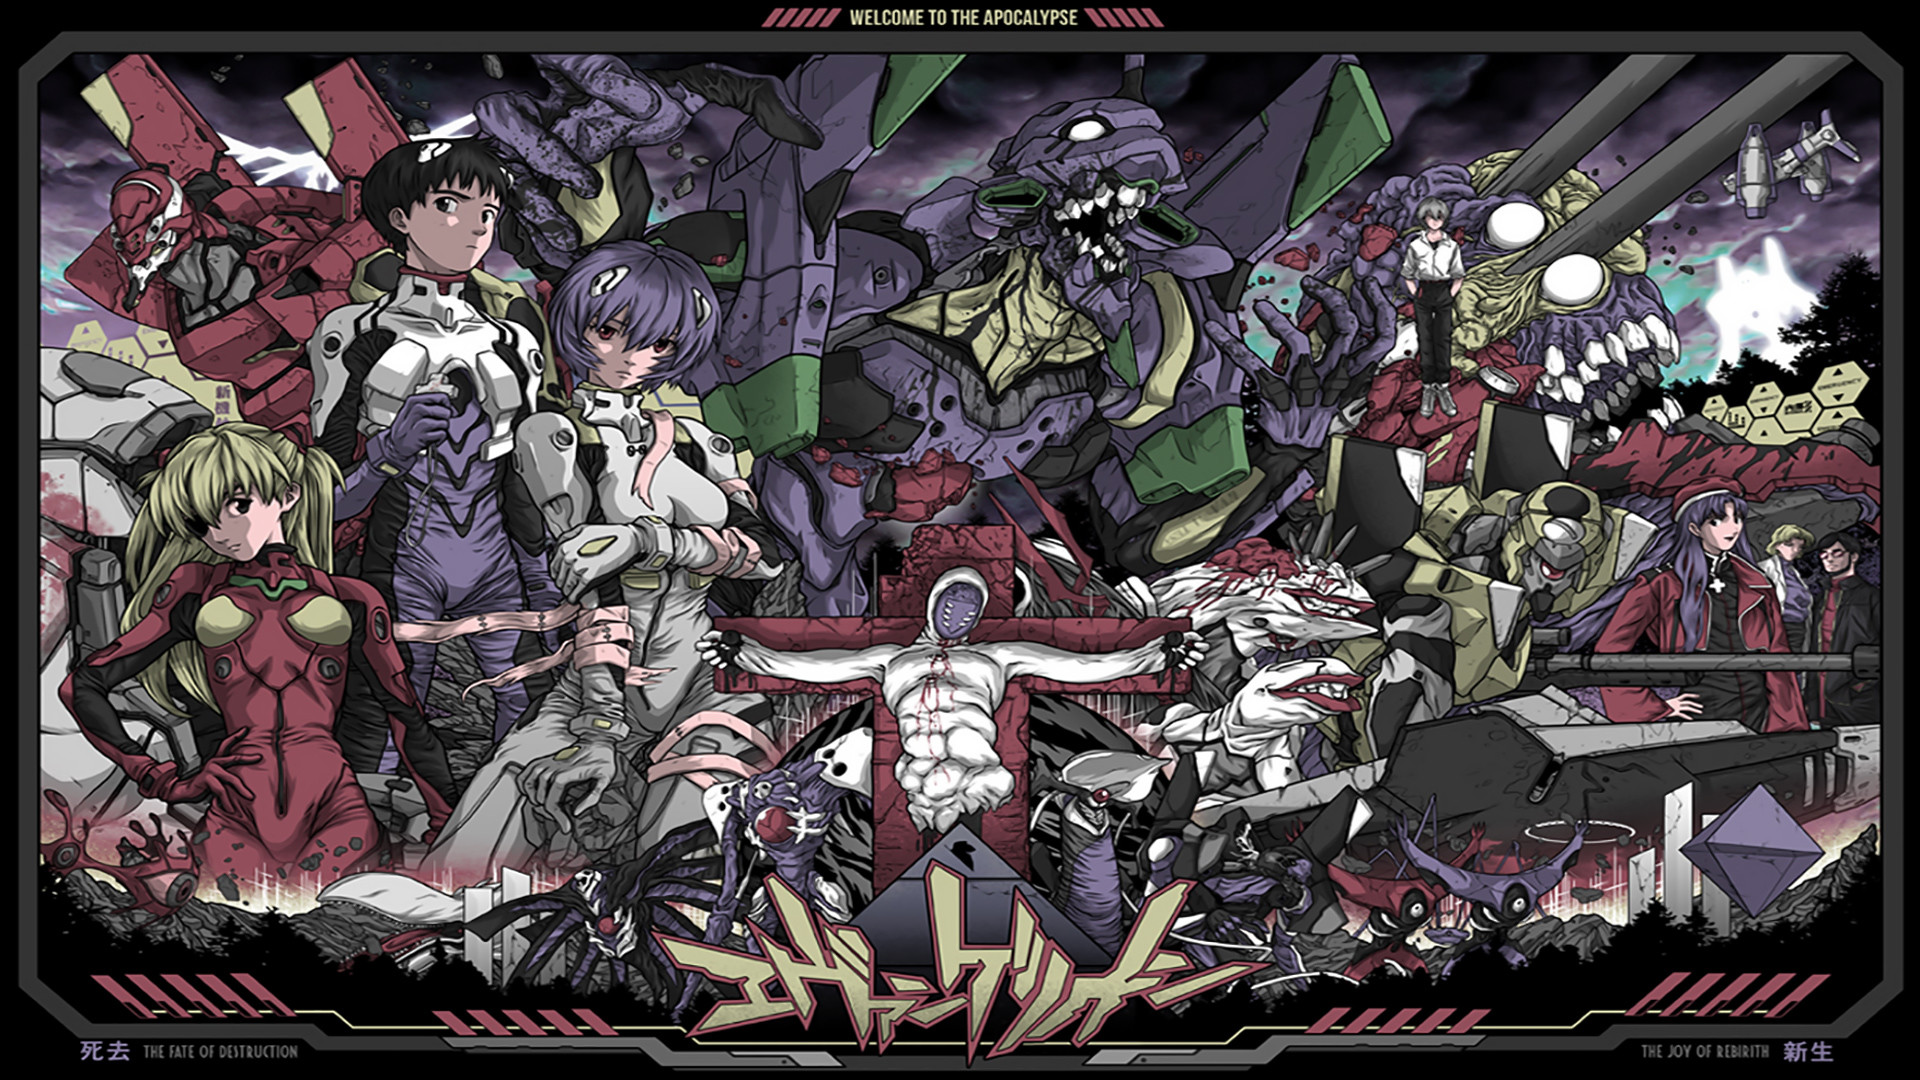 Evangelion Background (75+ images)